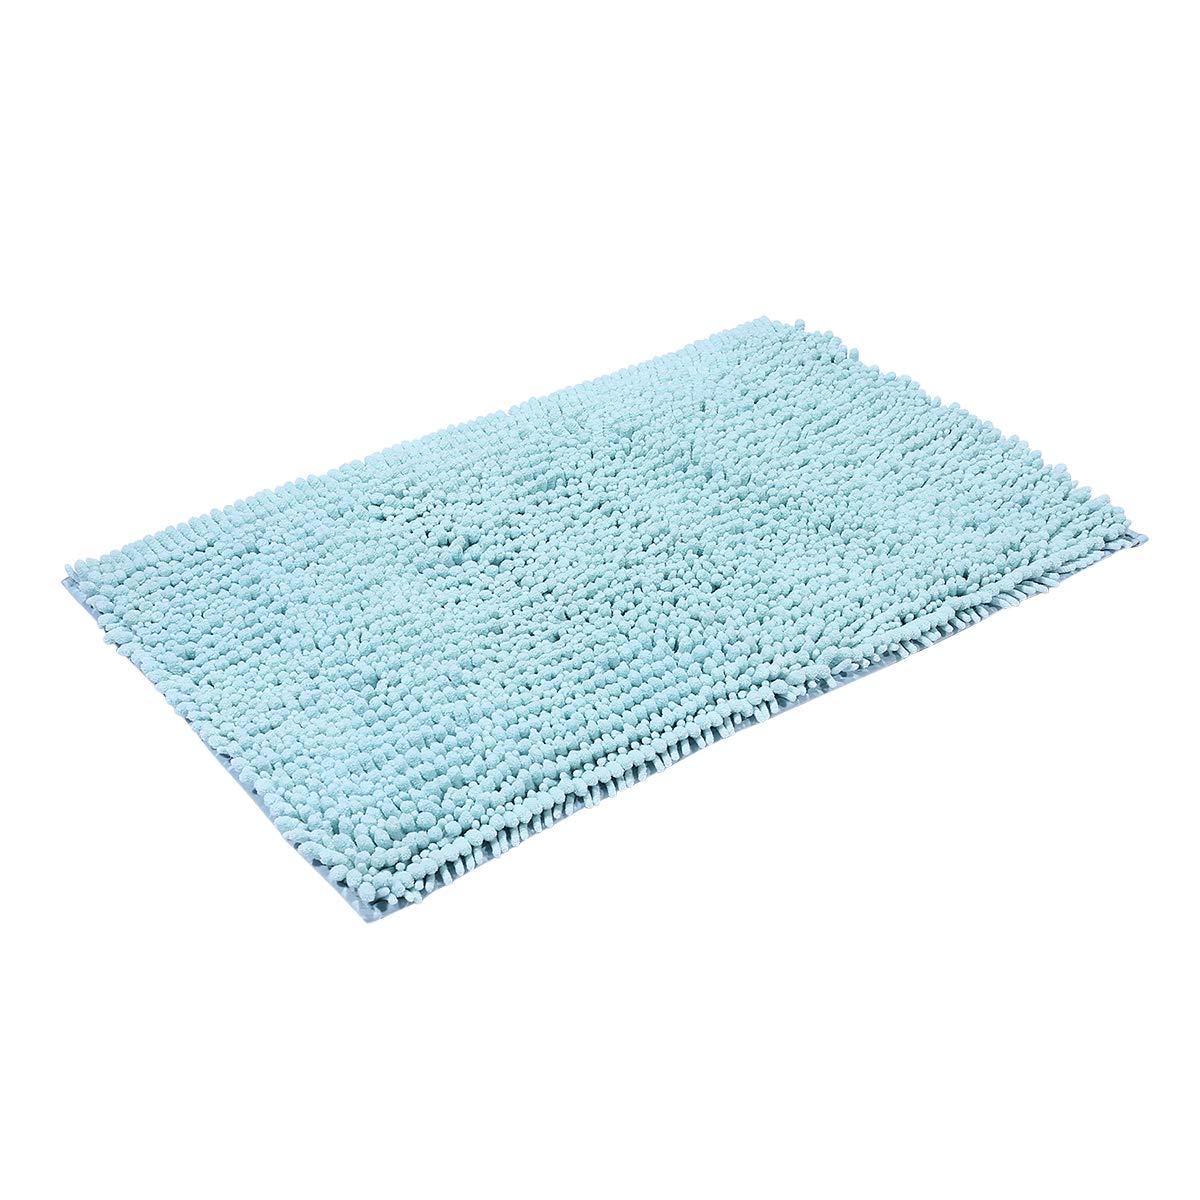 Chenille Non Slip Microfiber Shaggy Bath tub Rugs Bathroom Rug Toilet Rug Shower Room Rugs (19.6 by 31.5, Blue ) BR